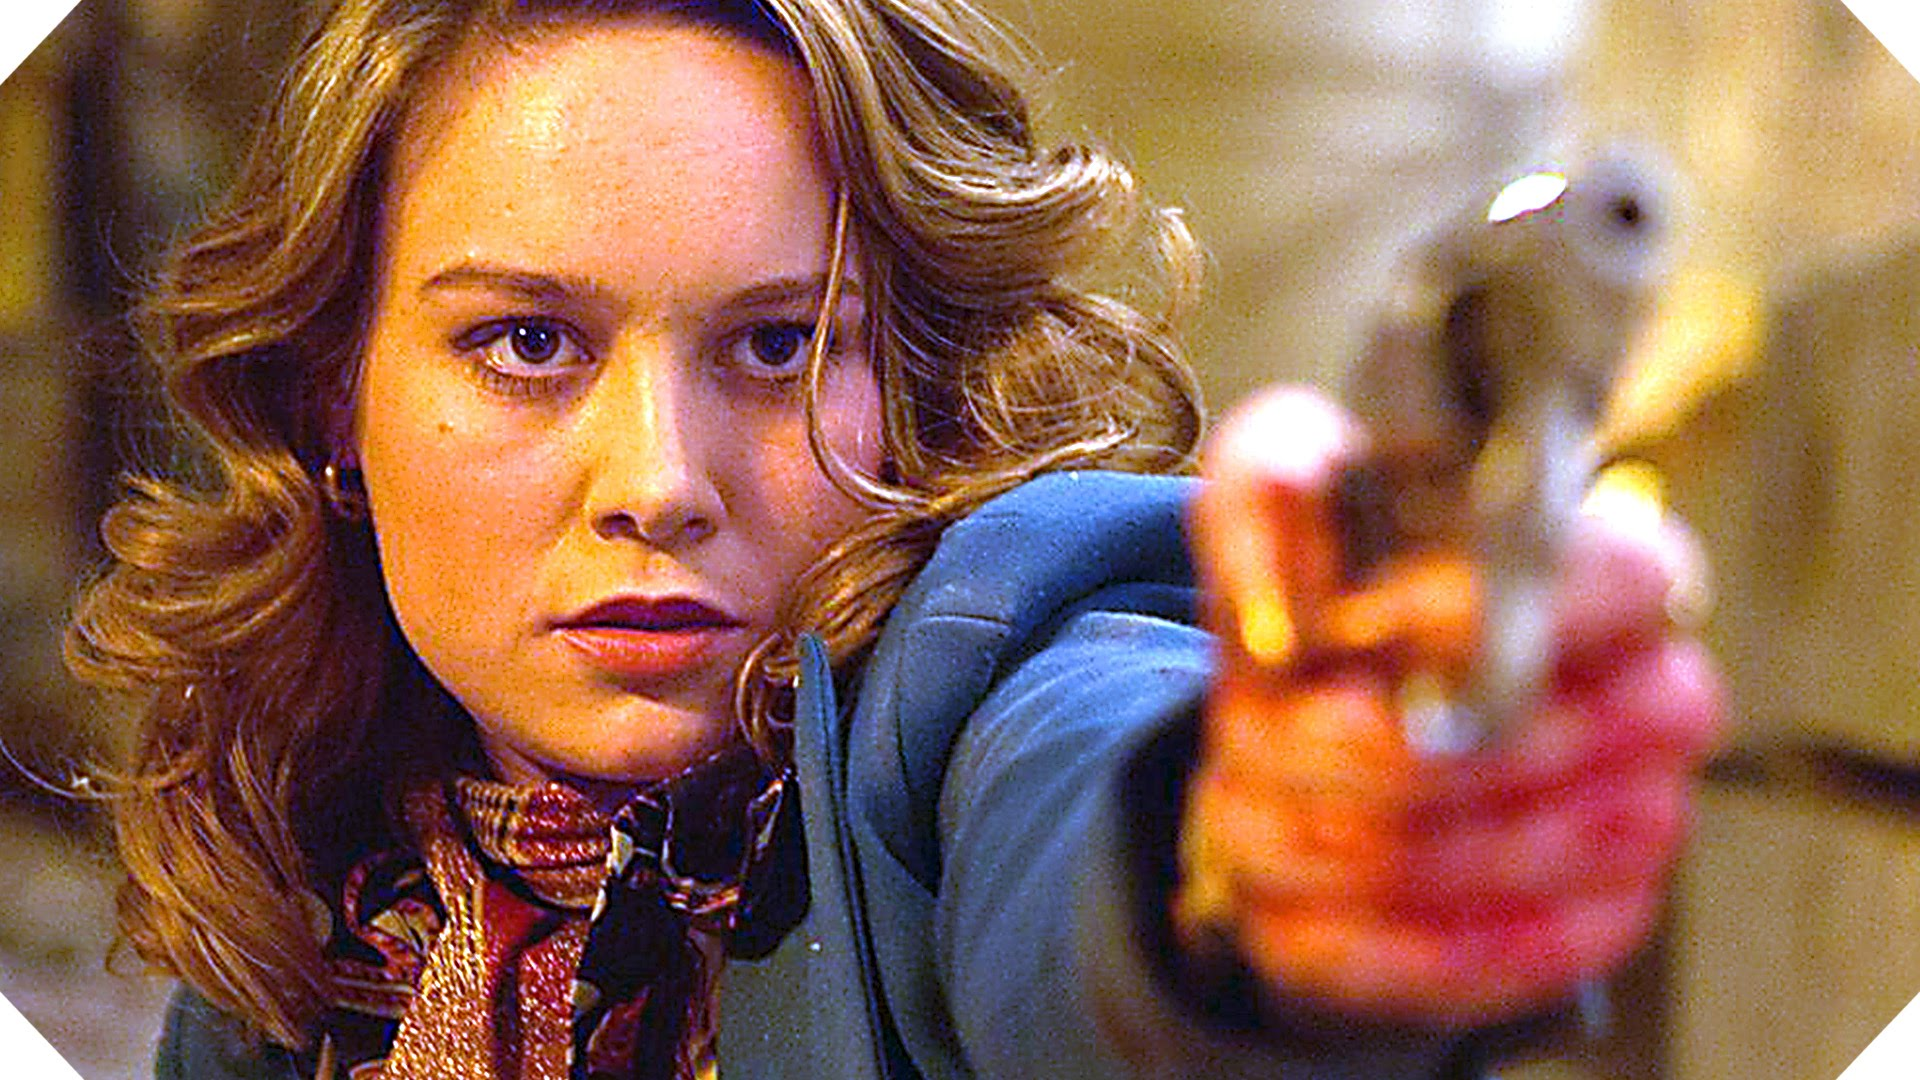 Brie Larson Free Fire movie